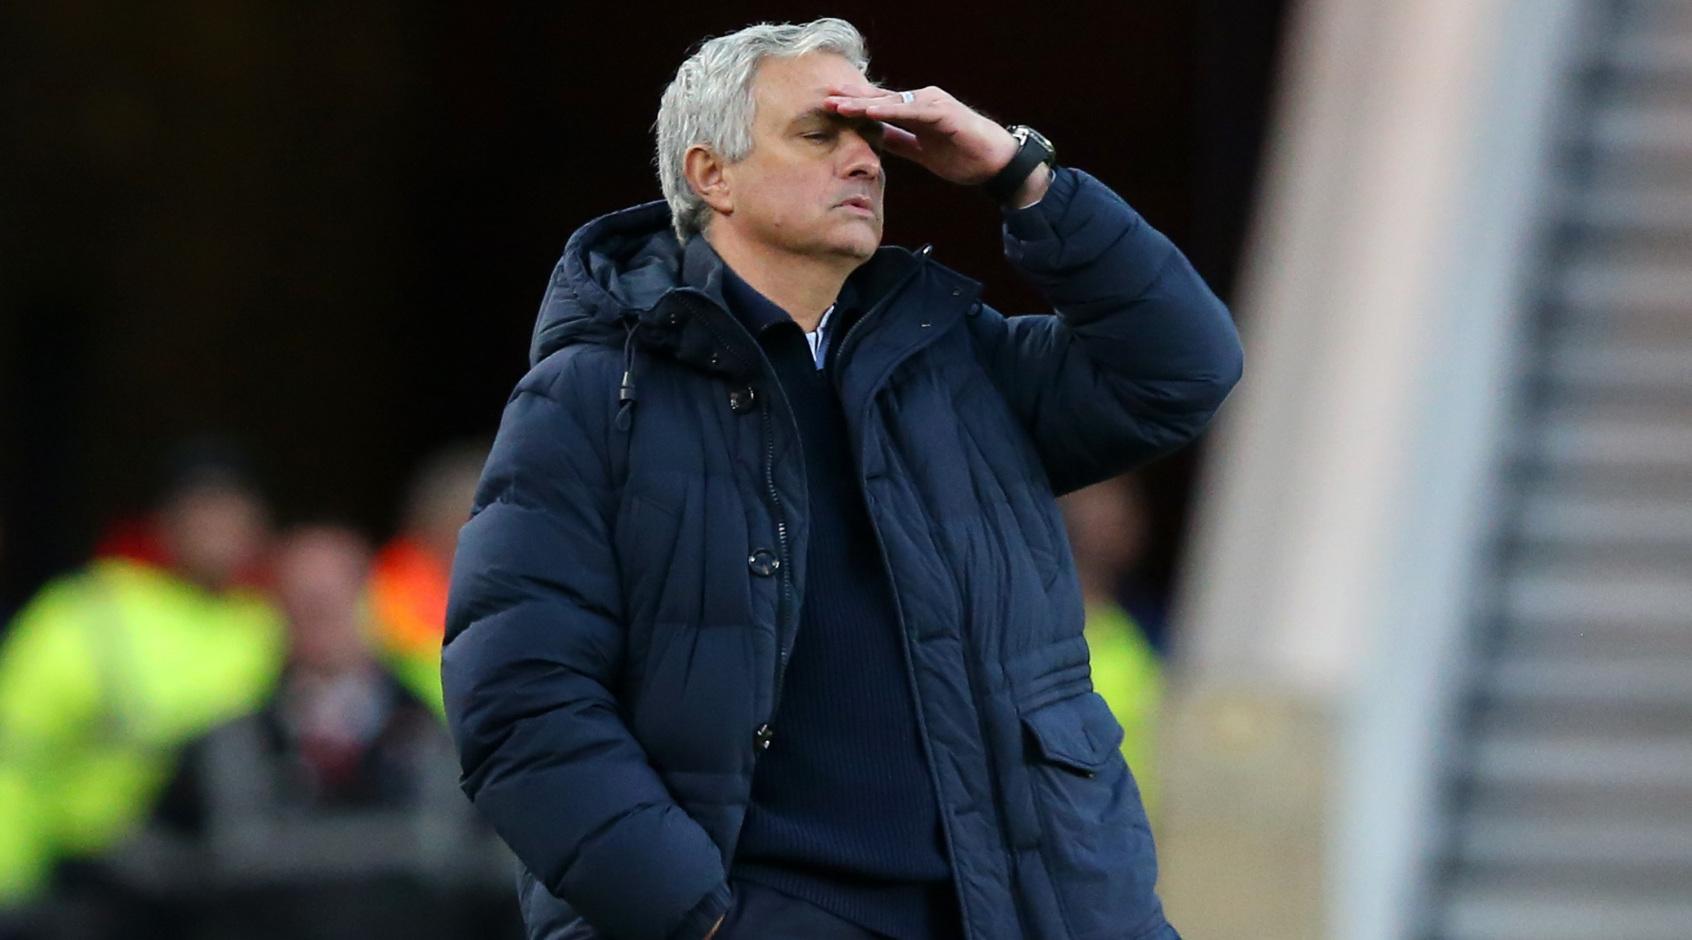 """Реалу"" три раза не говорят ""нет"", - Моуриньо рассказал об уходе из ""Интера"""